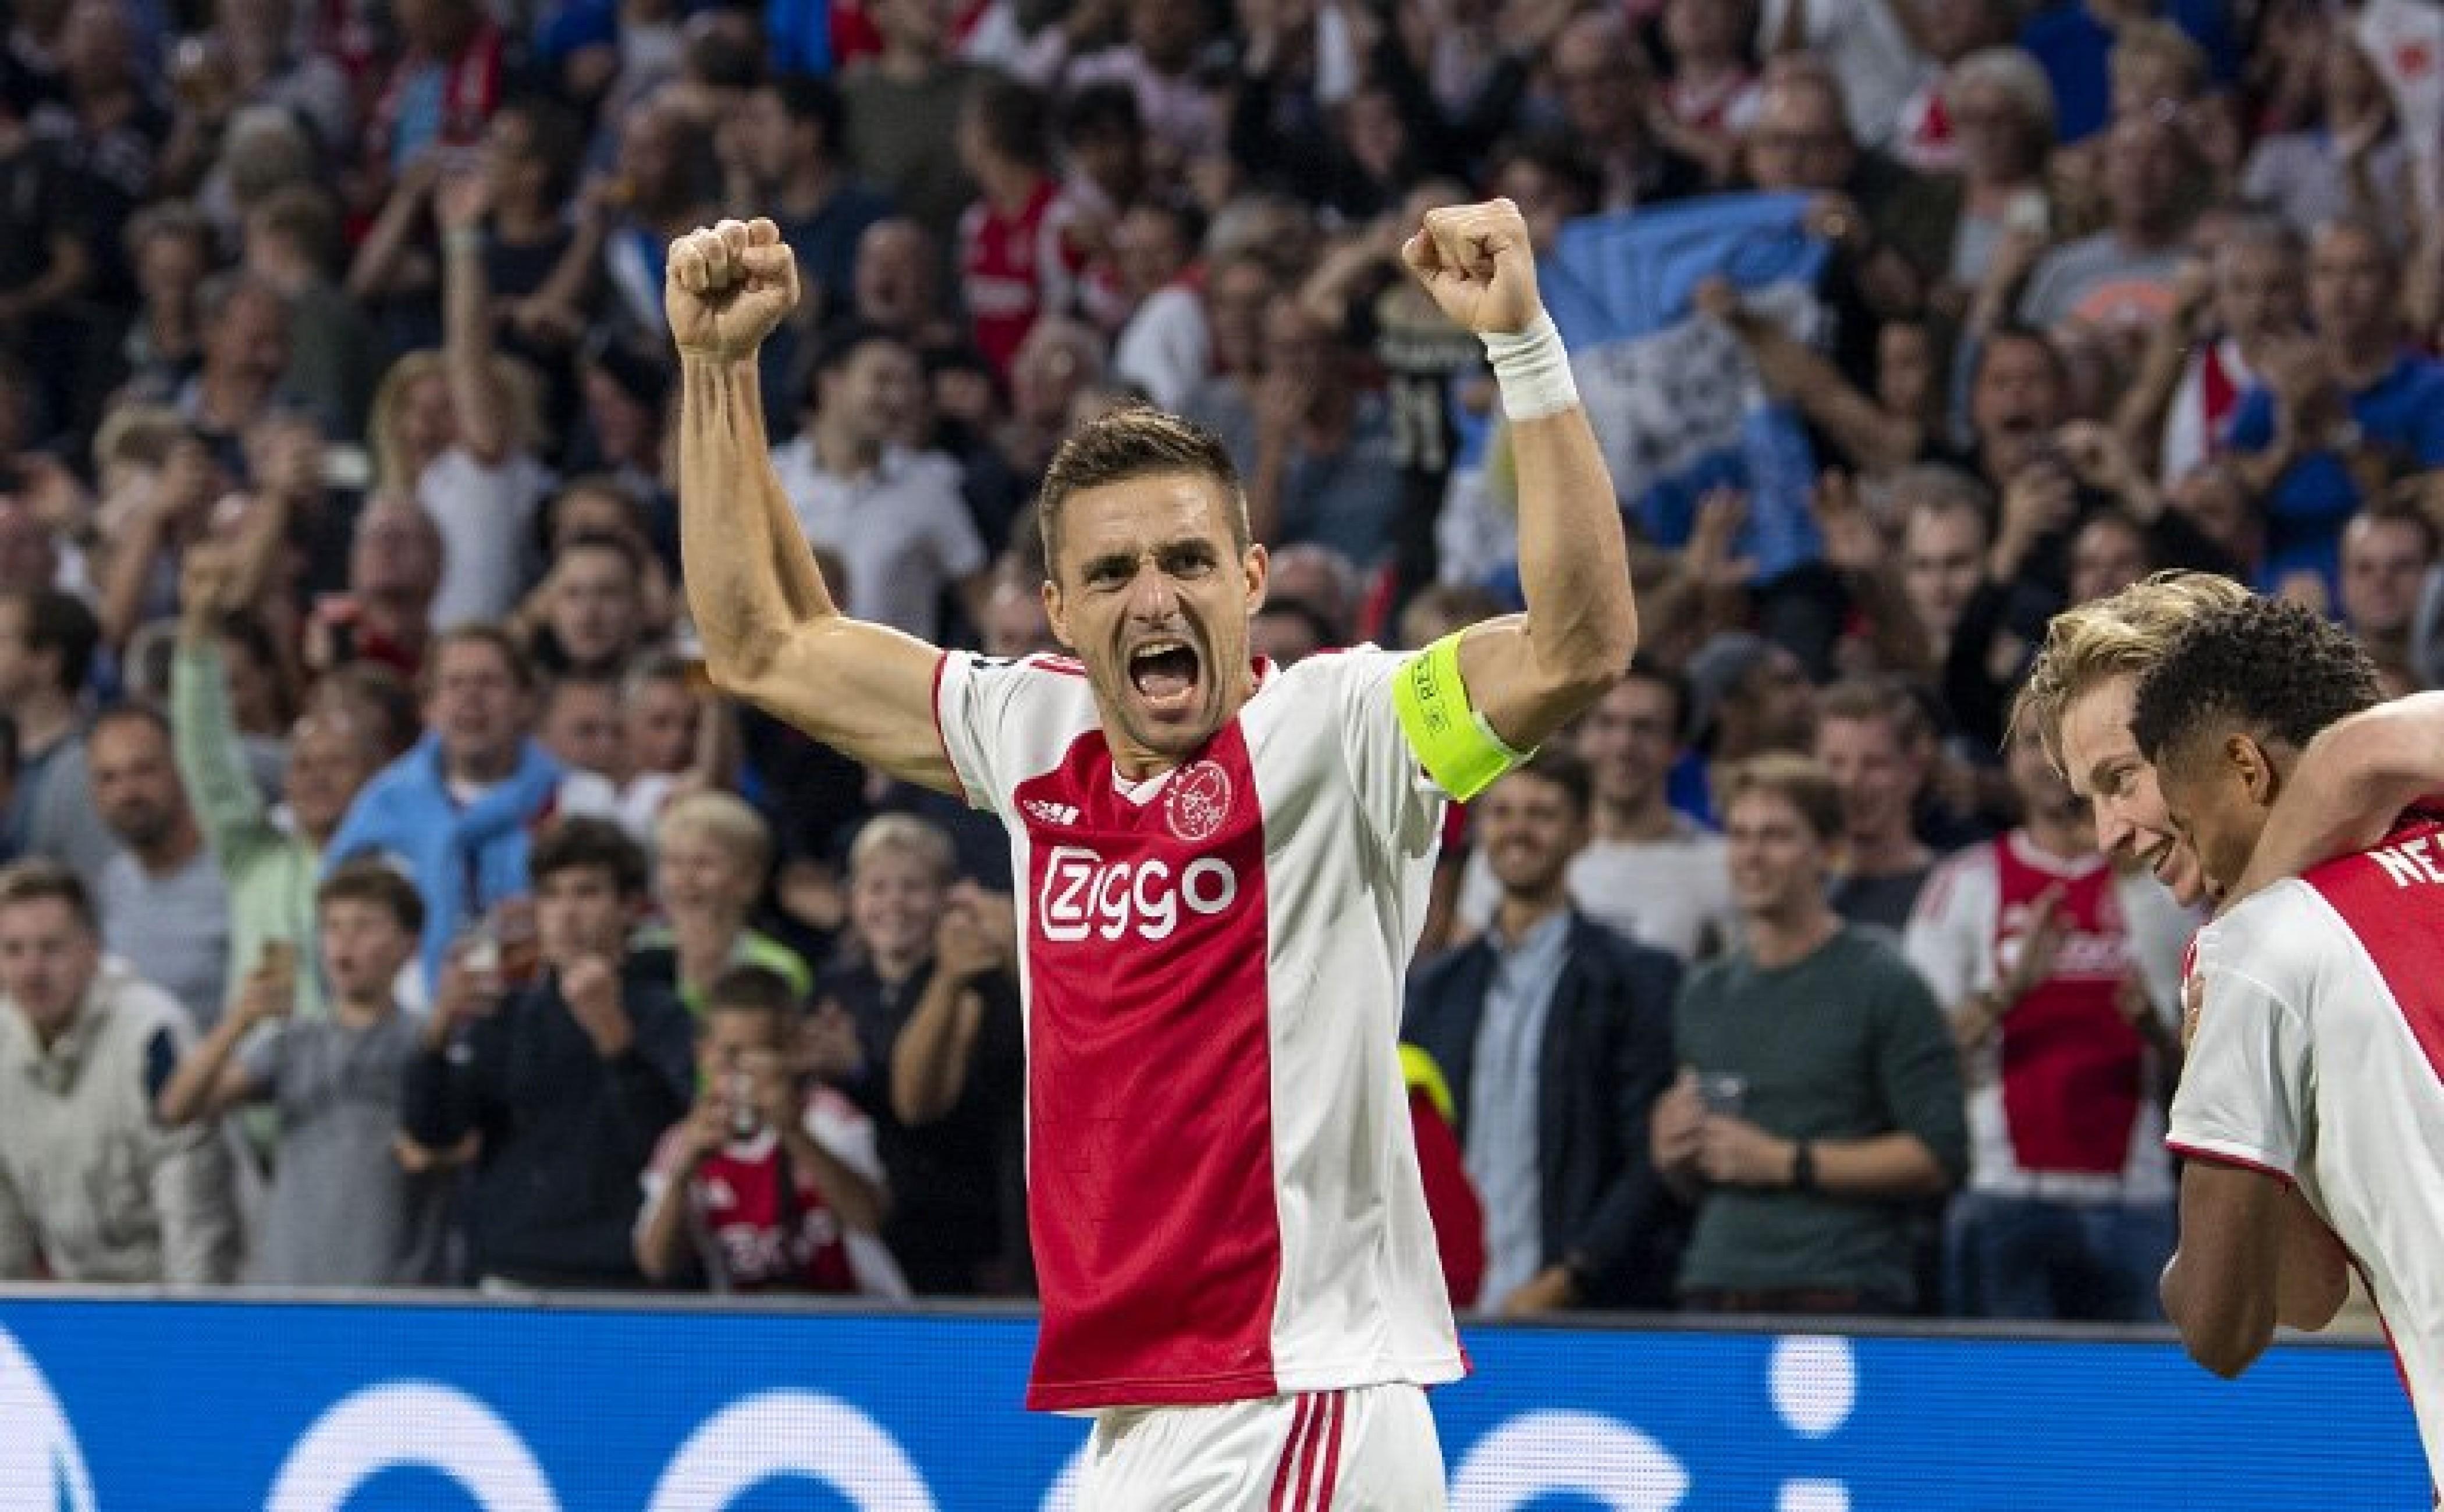 Champions League: l'Ajax dilaga contro l'AEK, mentre lo Shakhtar impatta sull'Hoffenheim